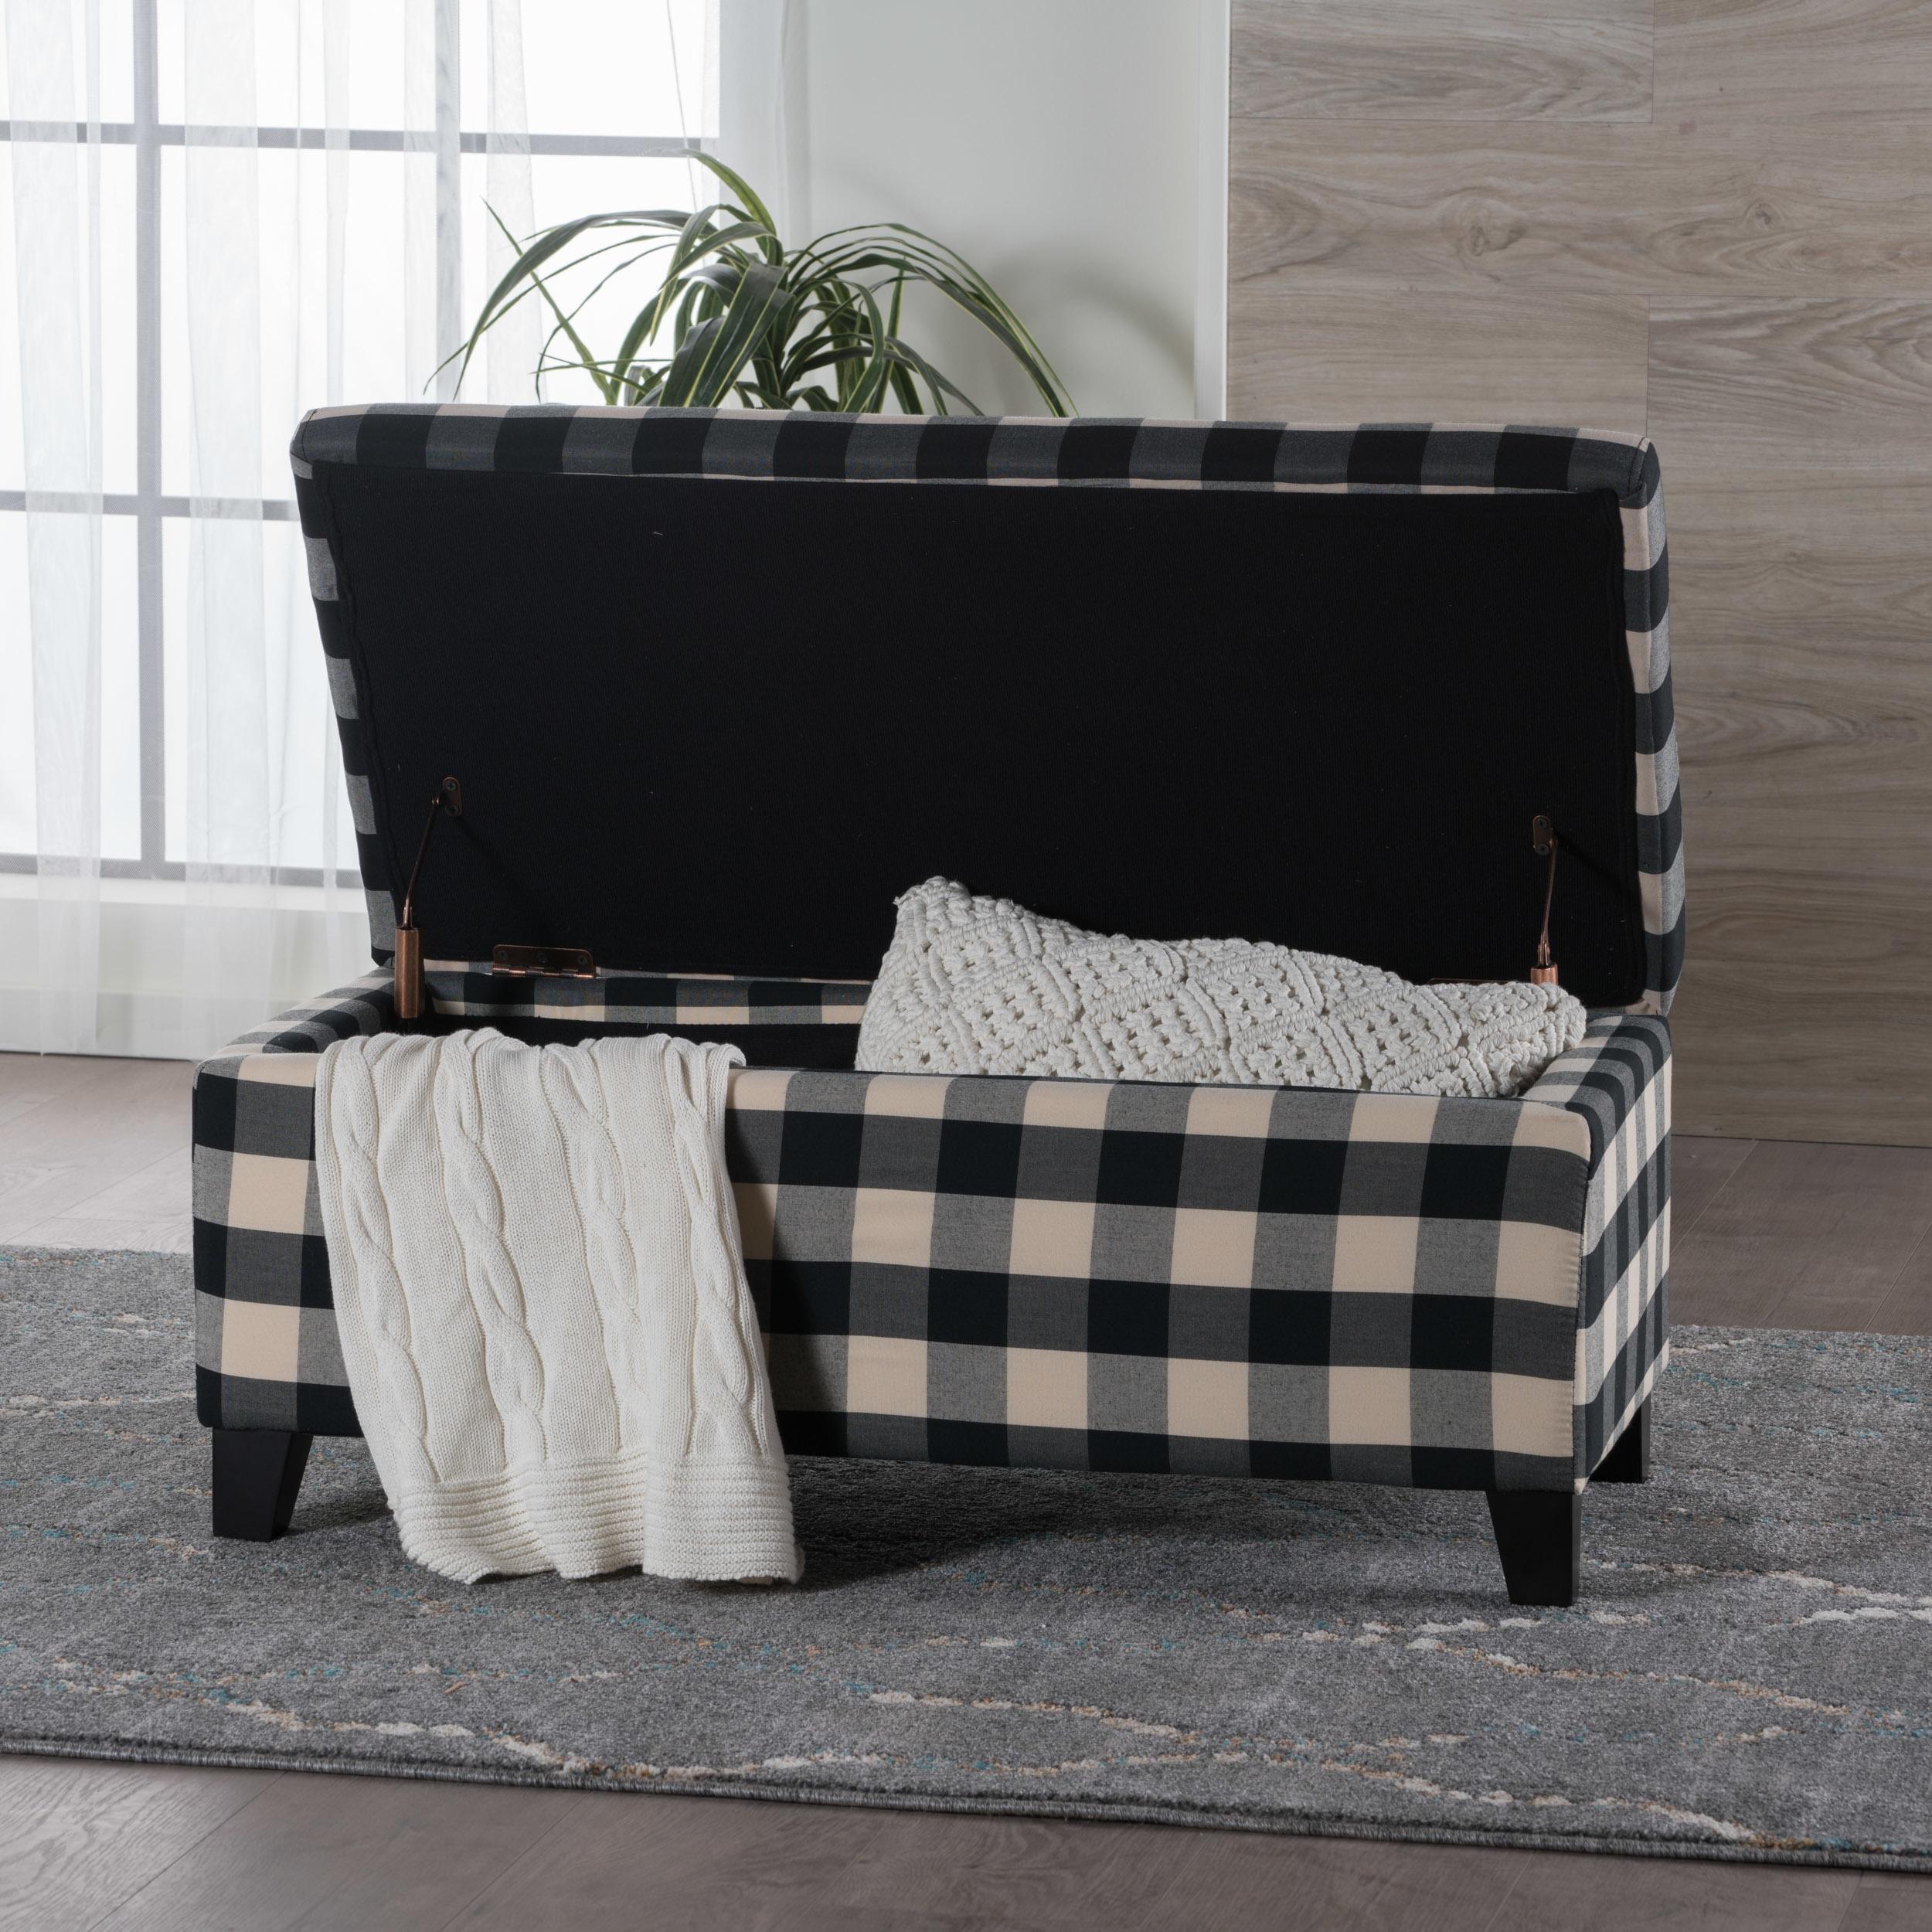 Awe Inspiring Matteo Plaid Pattern Fabric Square Storage Ottoman Bench By Christopher Knight Home Machost Co Dining Chair Design Ideas Machostcouk